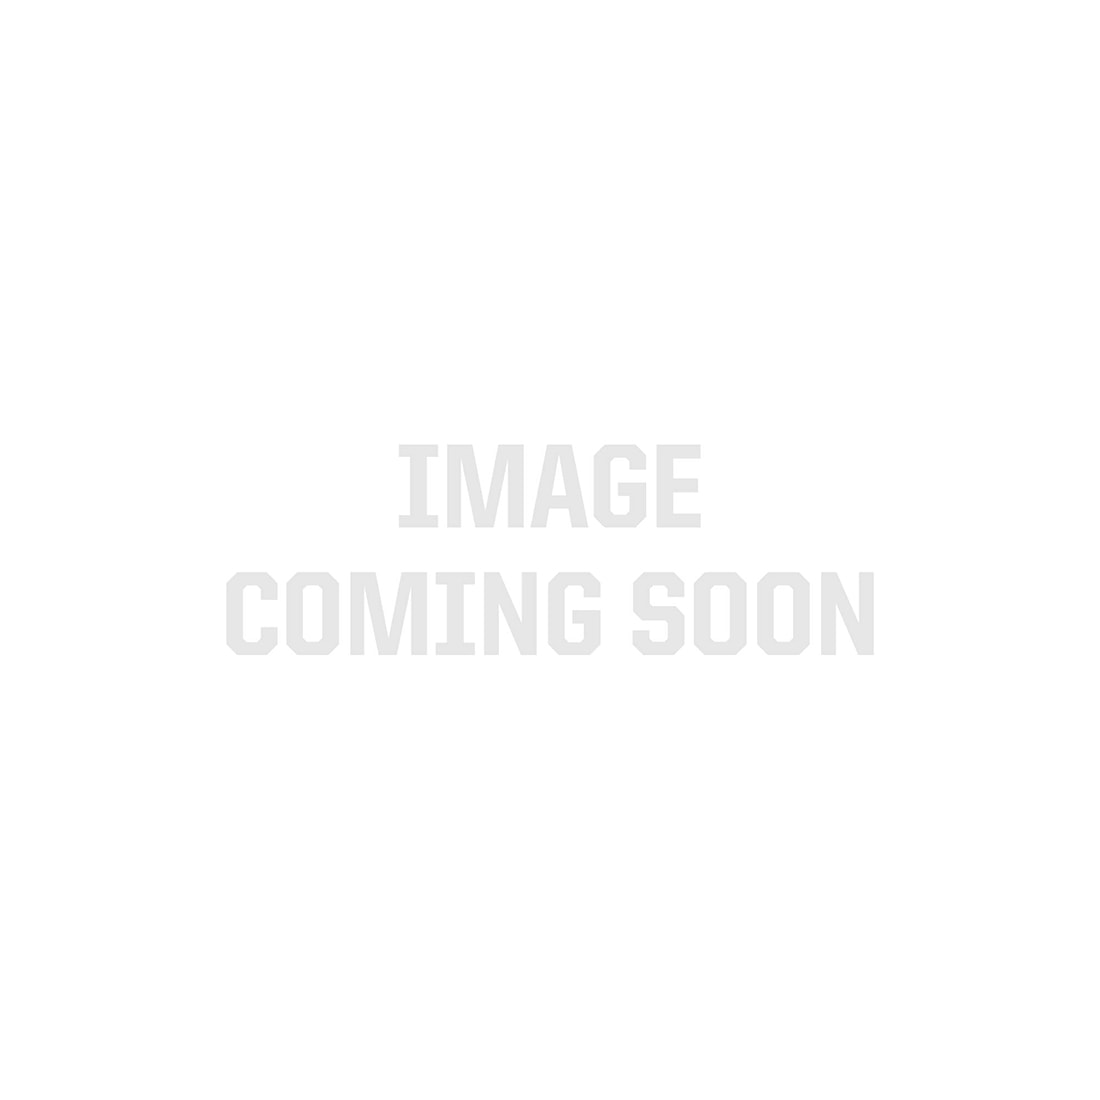 Daylight White 2835 Single Row CurrentControl LED Strip Light, 120/m, 10mm wide, Sample Kit